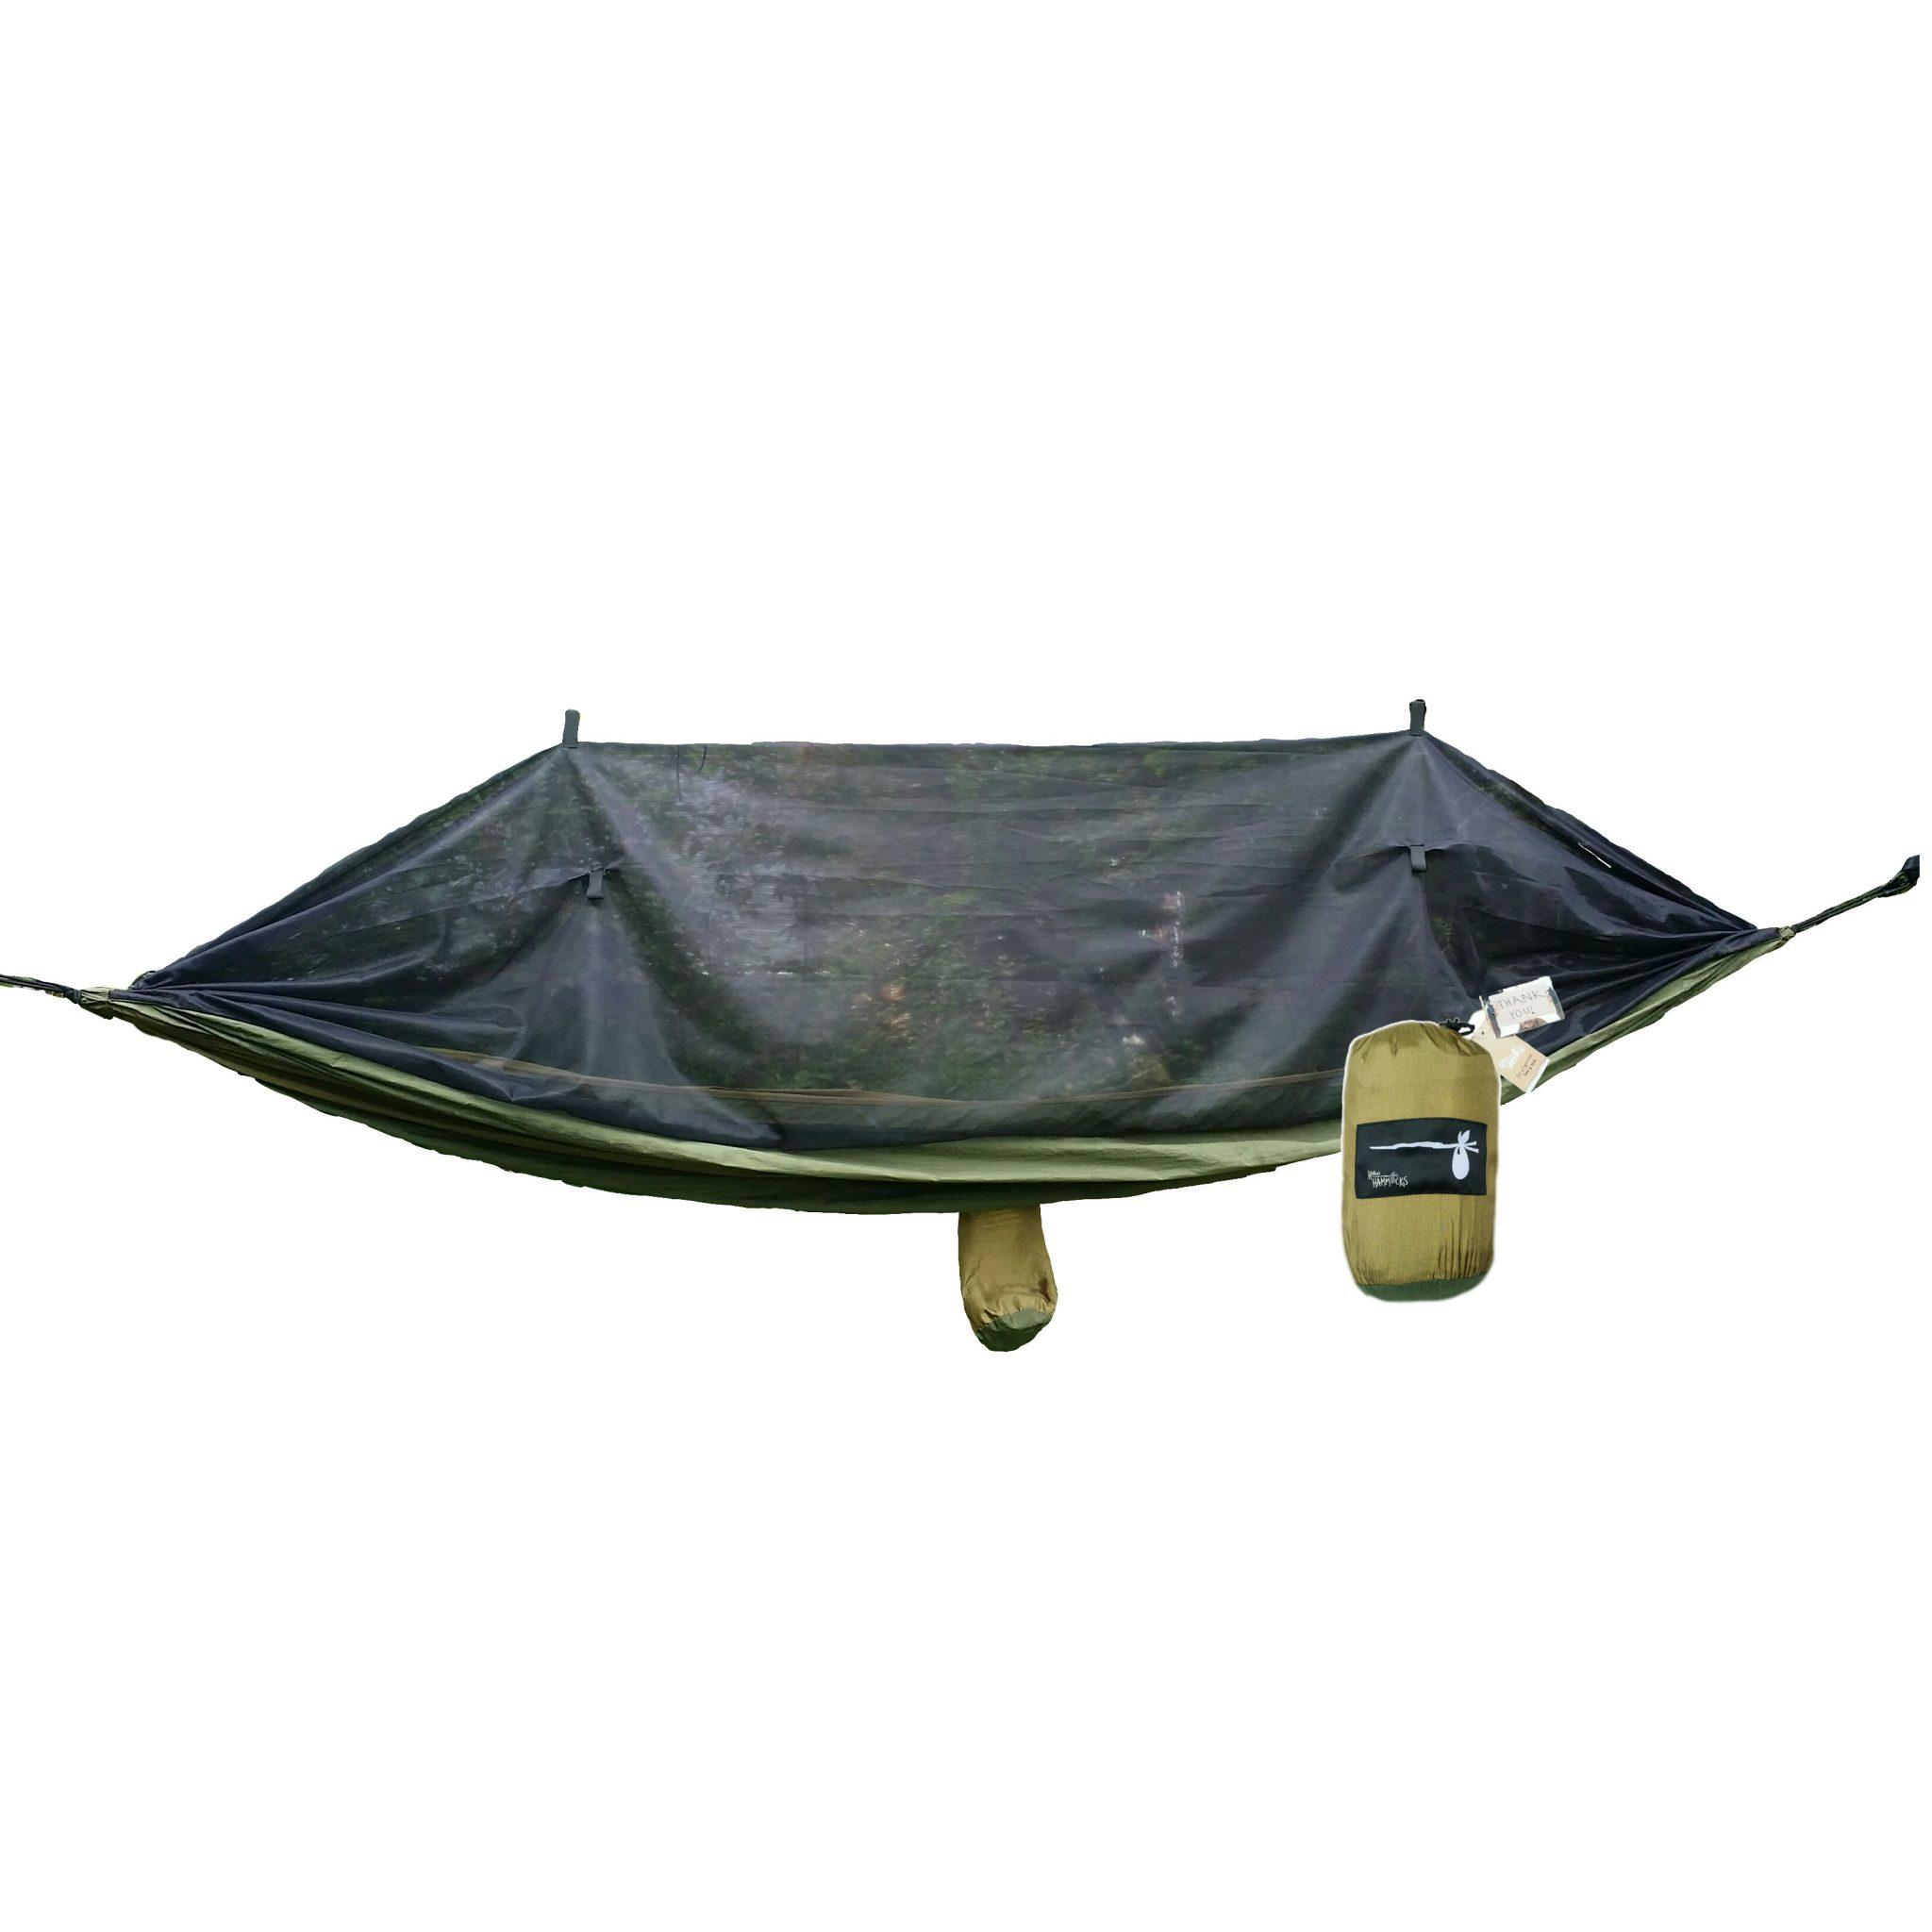 Double Skeeto Shield Mosquito Net Hammock Hobo Hammocks